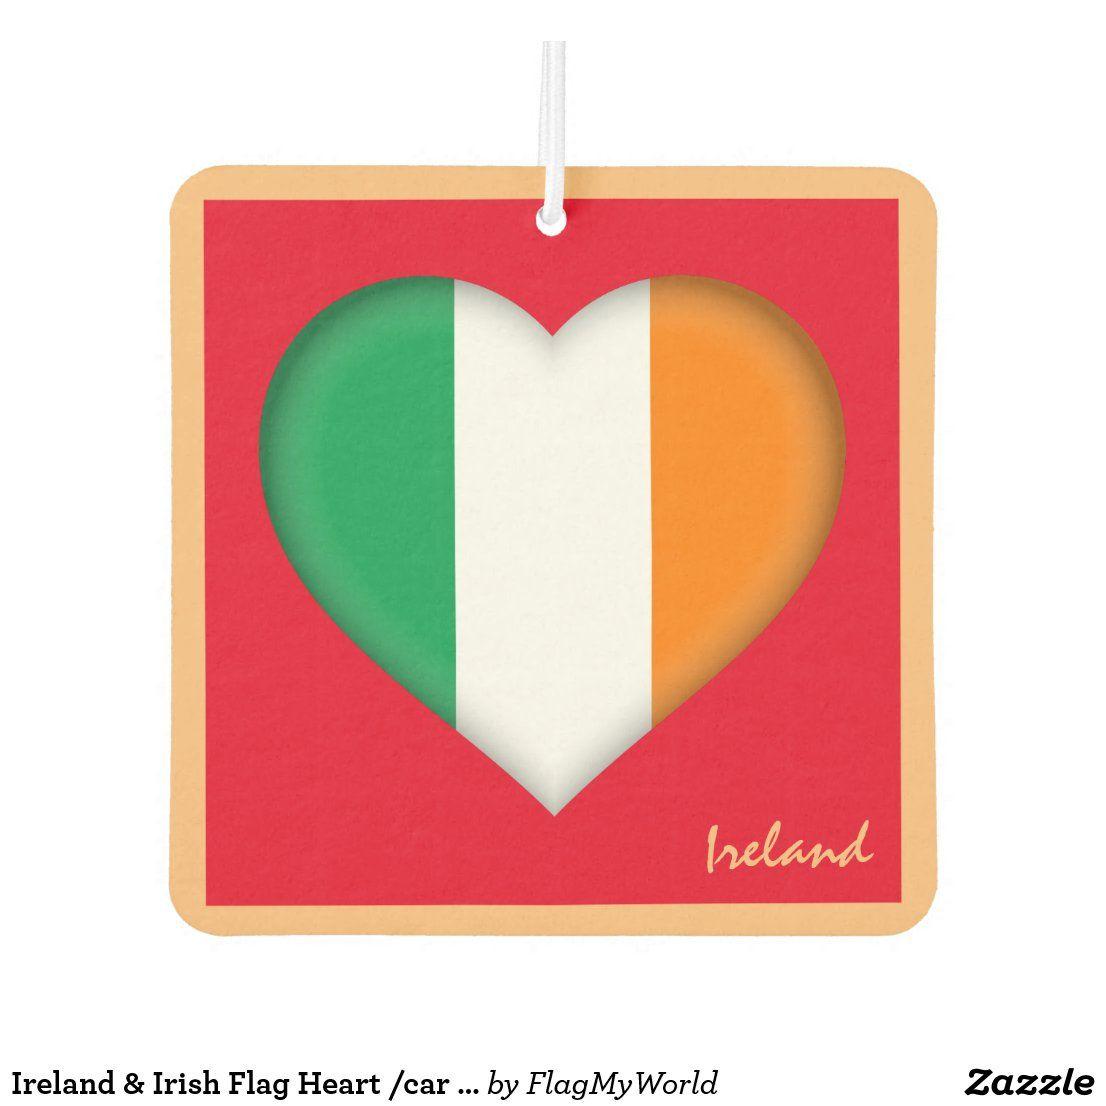 Ireland Irish Flag Heart Car Travel Sticker Air Freshener Zazzle Com In 2021 Travel Stickers Irish Flag Car Travel [ 1106 x 1106 Pixel ]